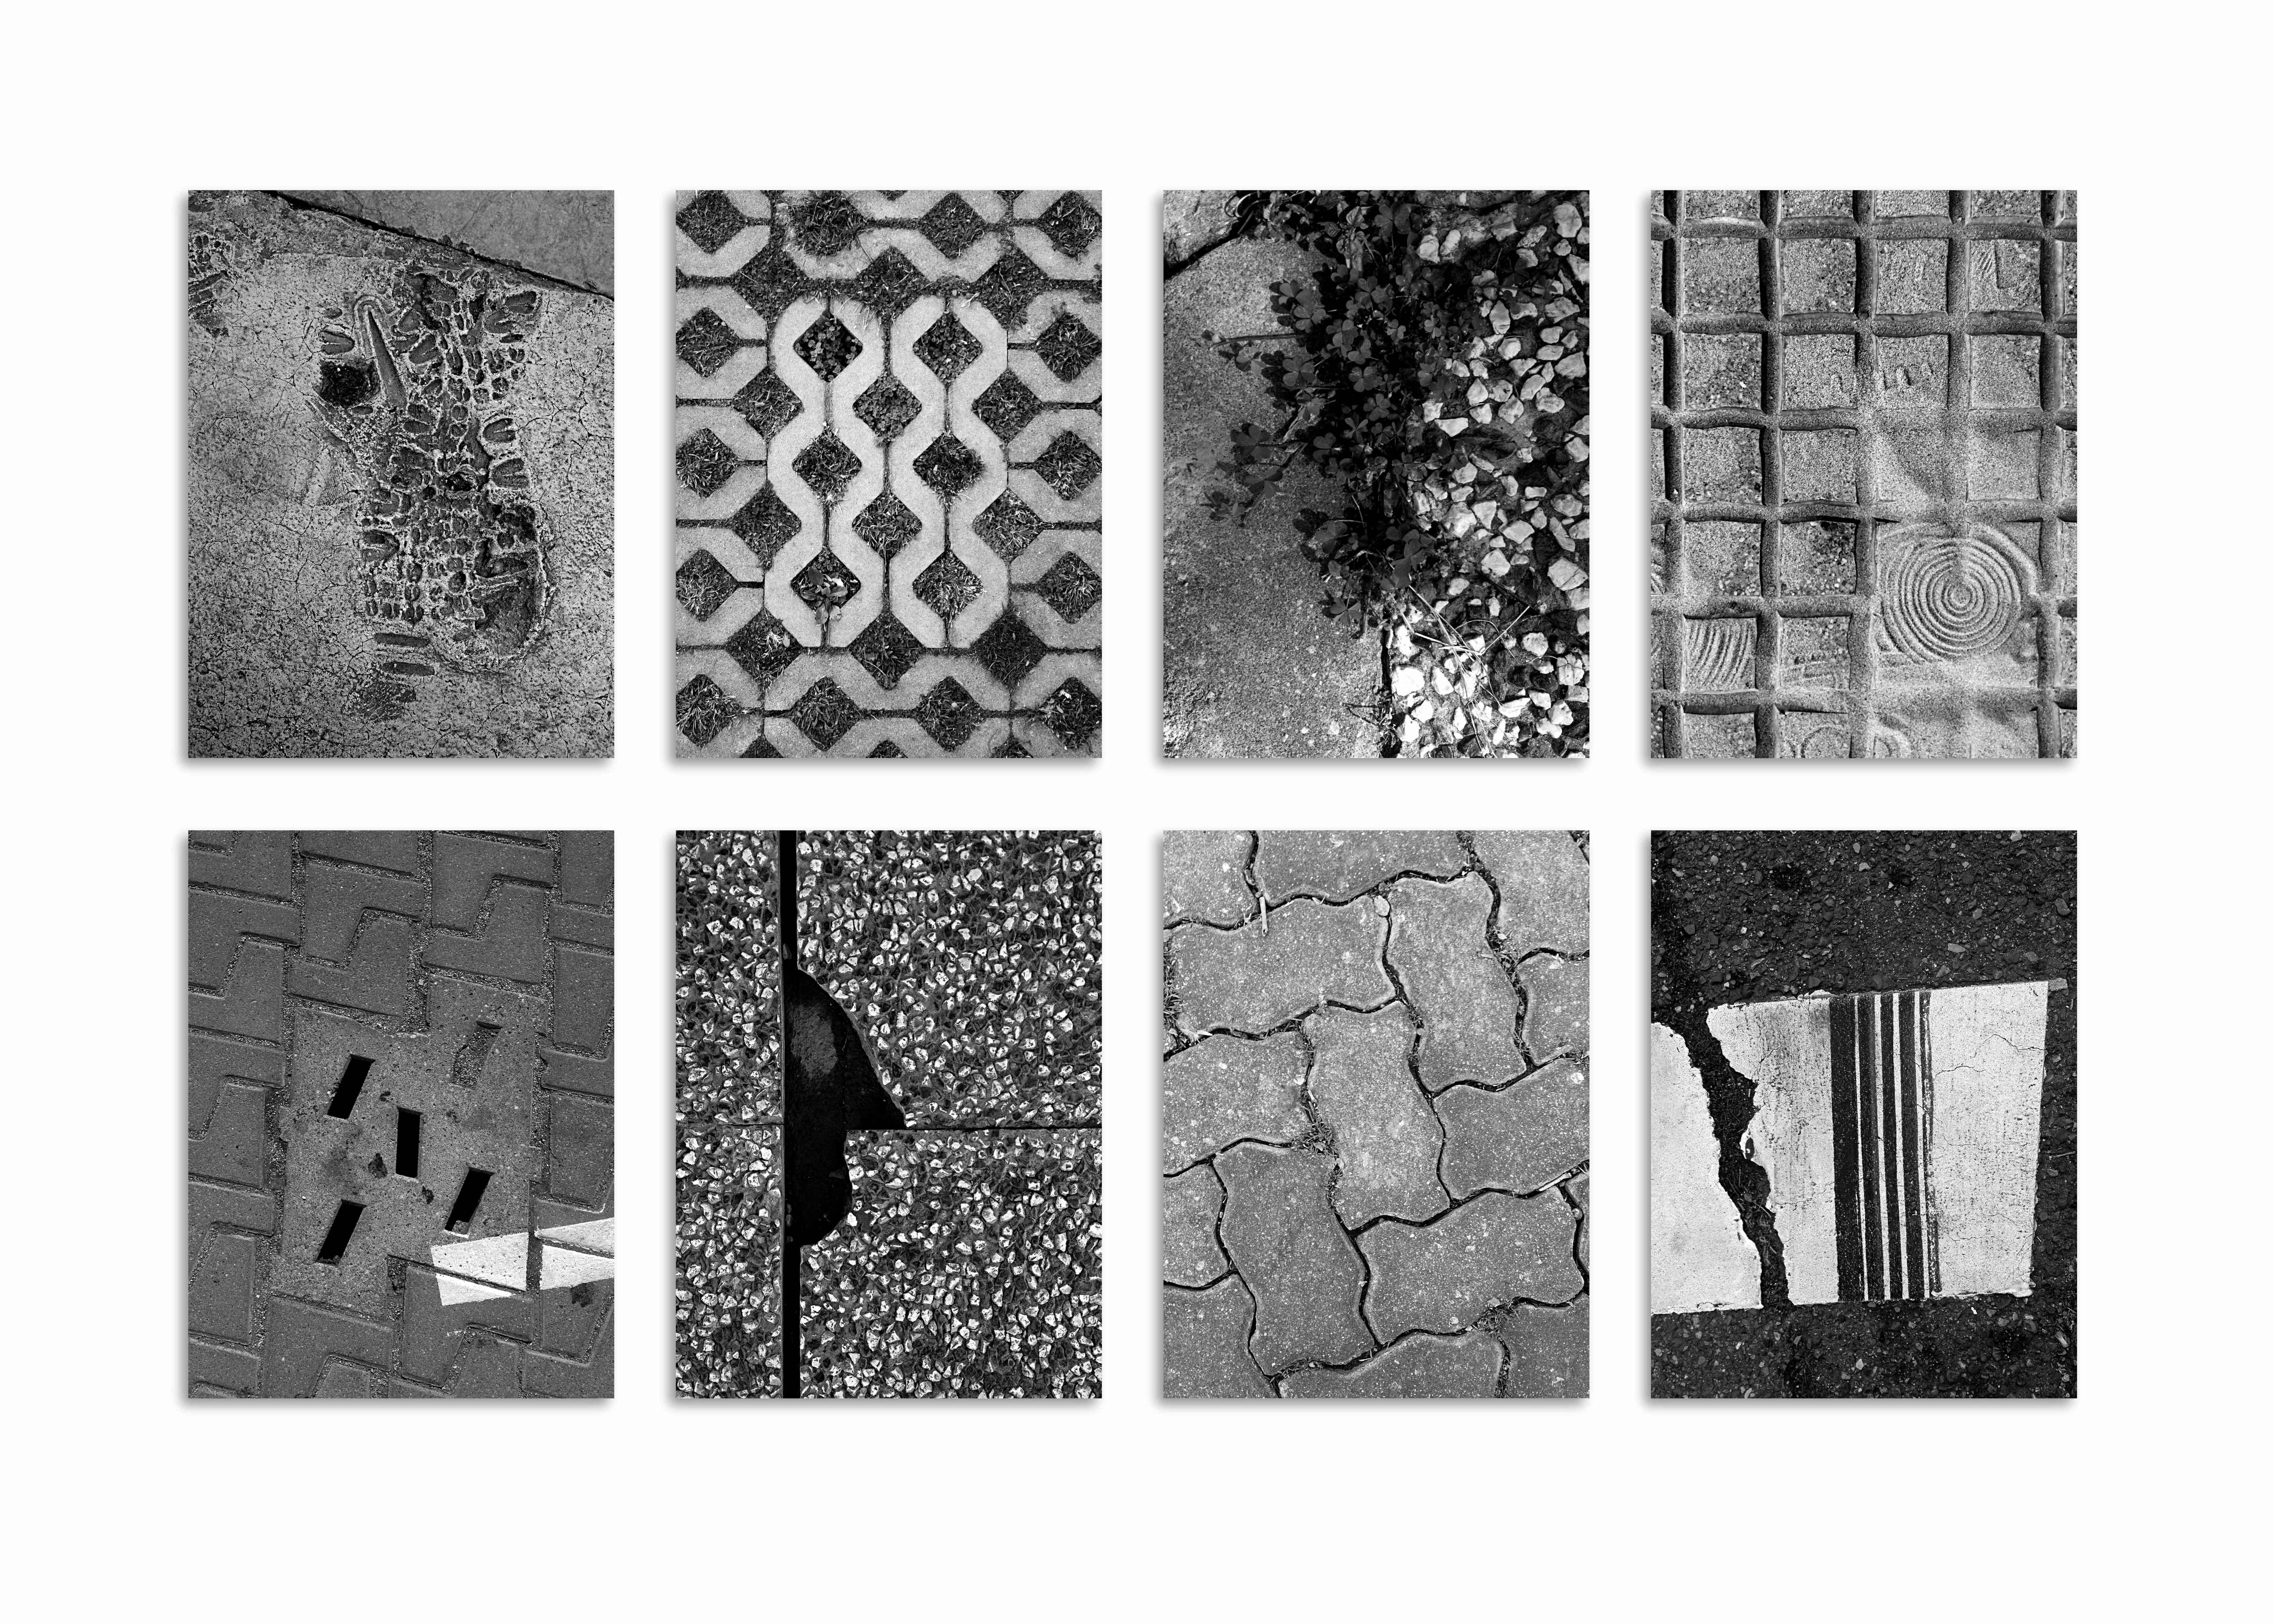 TRAYECTOS by Miguel Iguacen - Creative Work - $i